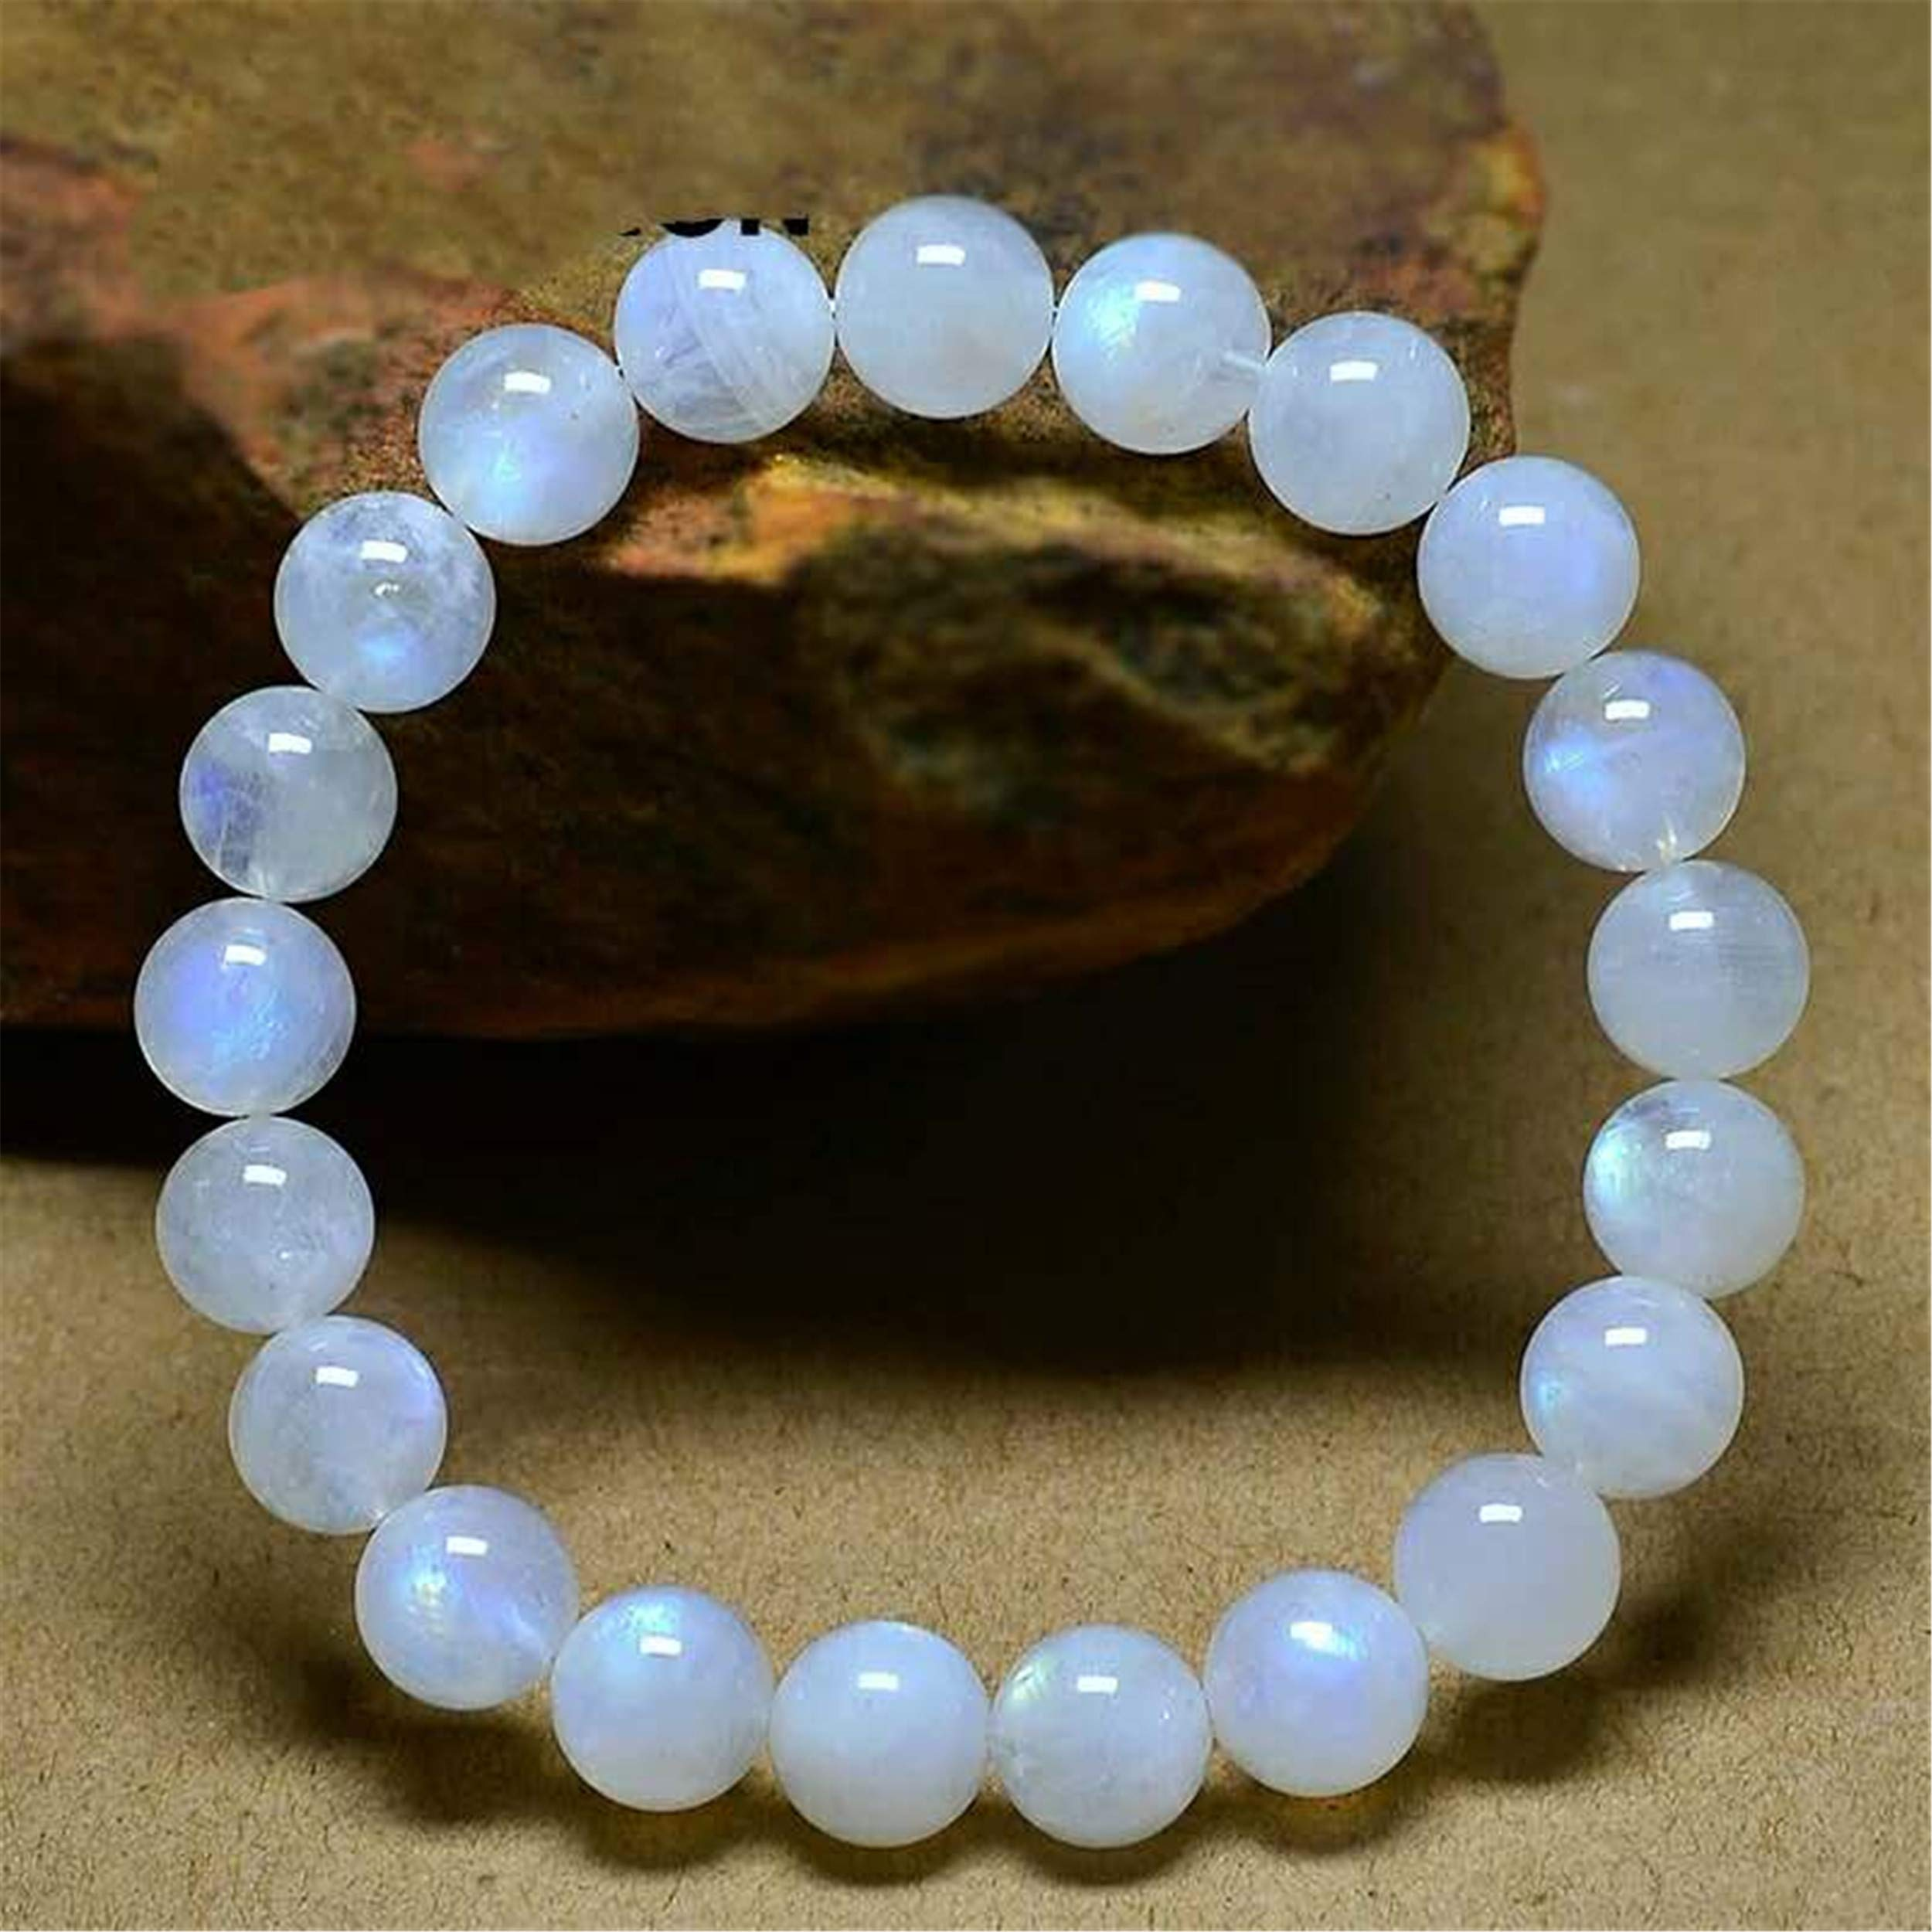 9mm Natural Moonstone Gemstone Stretch Healing Crystal Round Bead Bracelet by YF-Crystalbeads